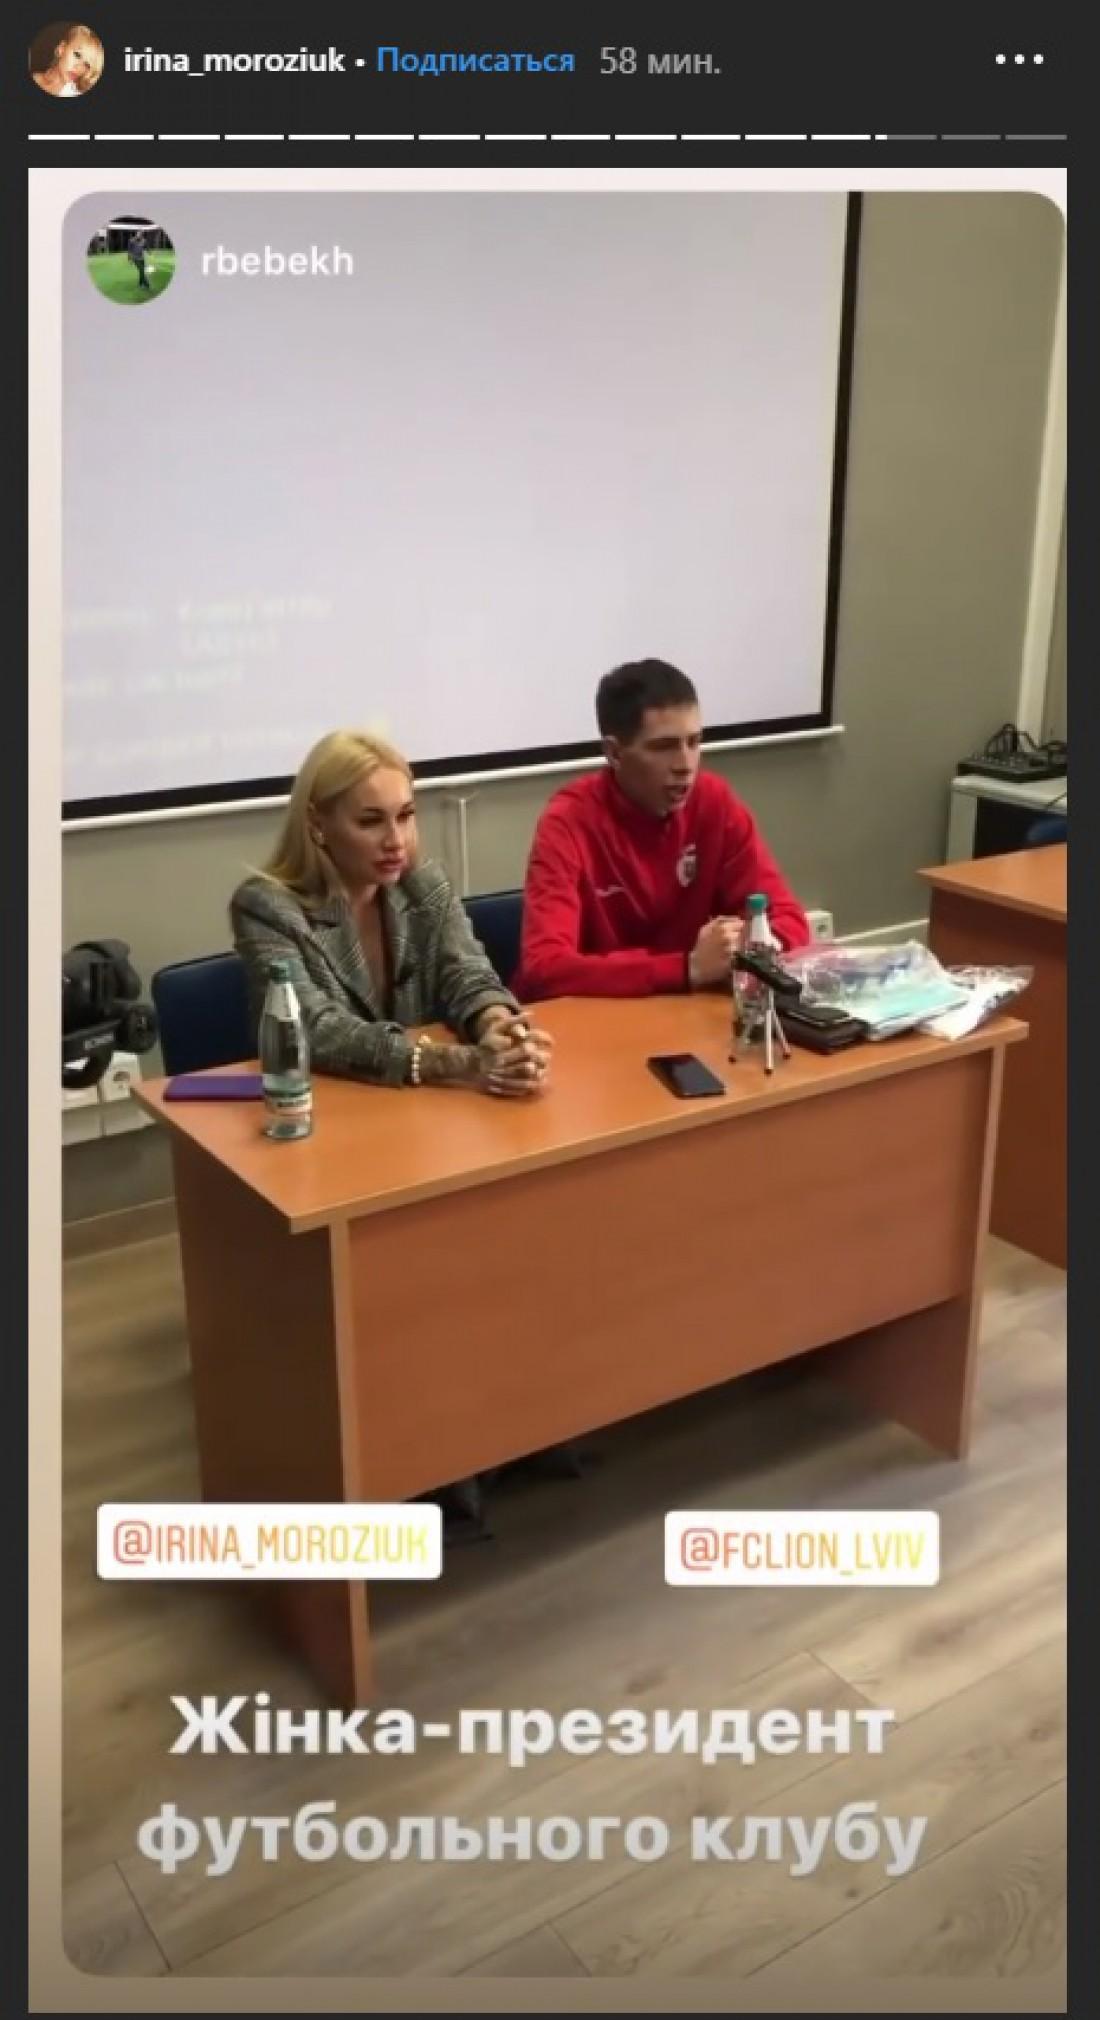 Ирина Морозюк стала президентом FC LION